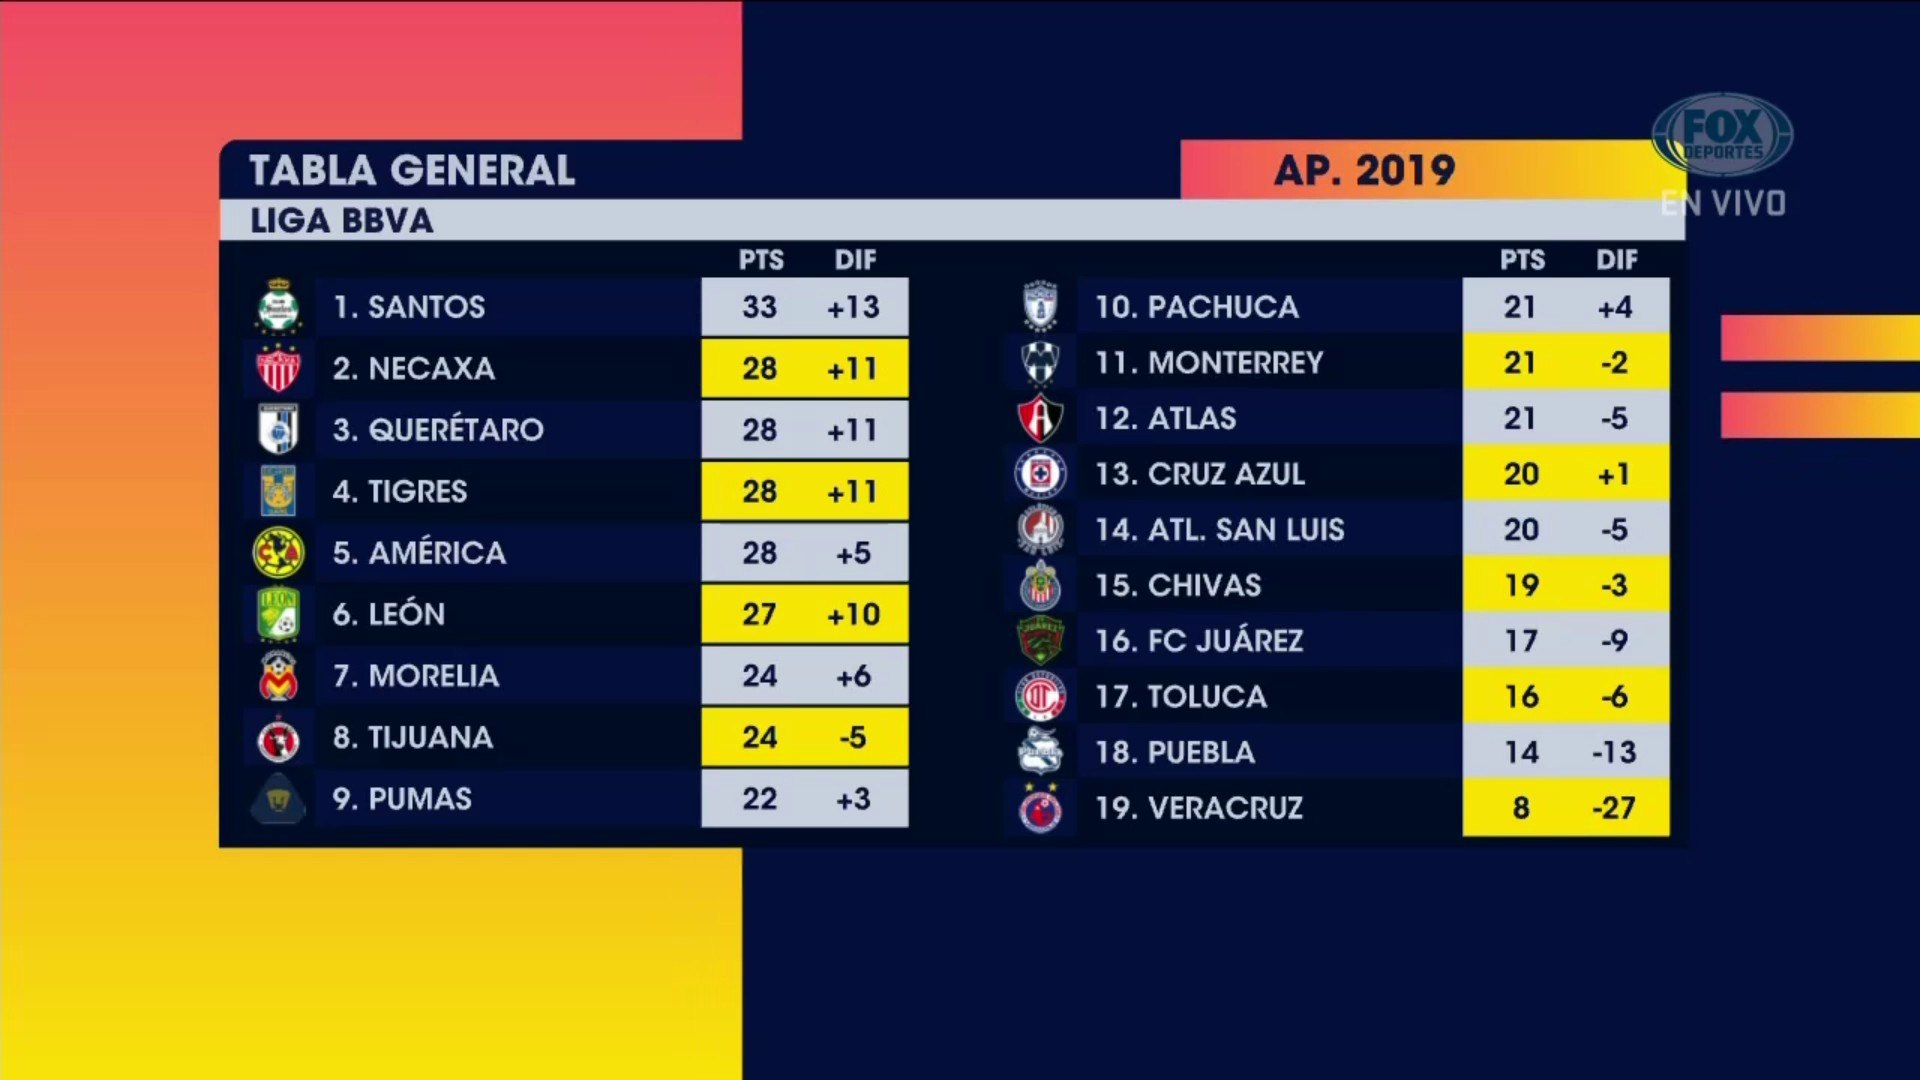 Agenda FS: Esta jornada definirá mucho en la Liga MX